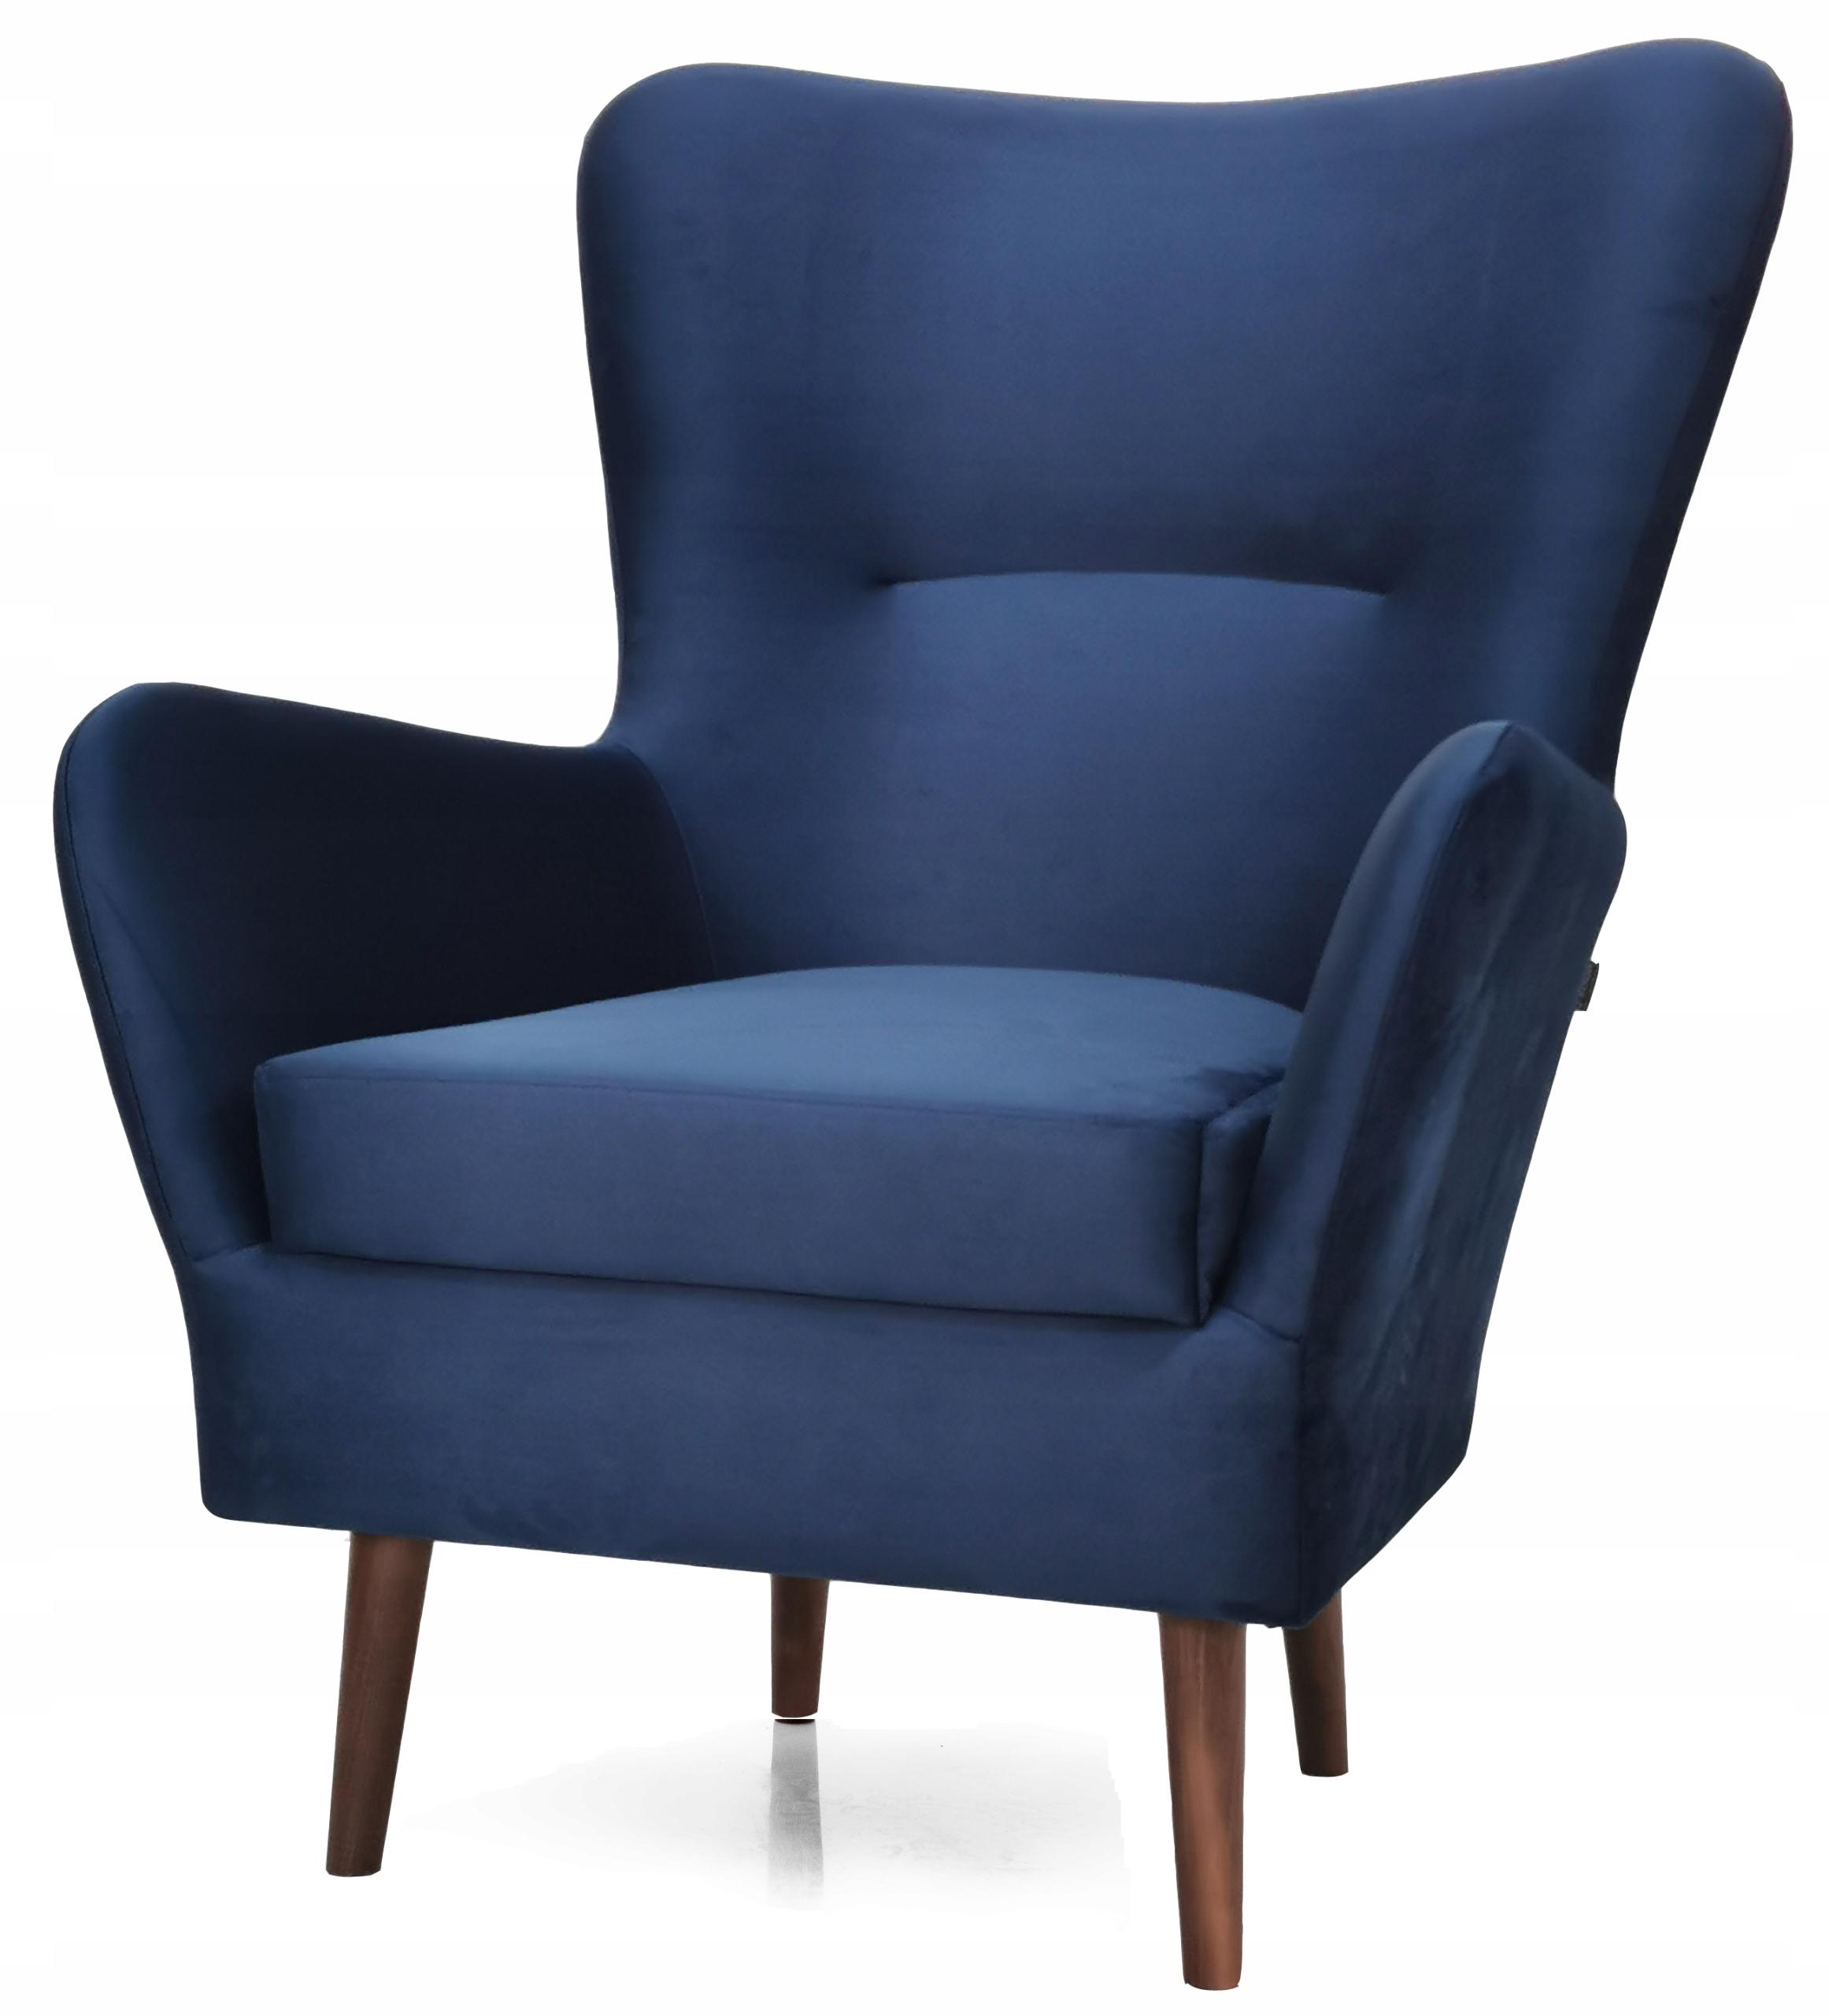 Скандинавское кресло CARMO retro MANUFACTURER